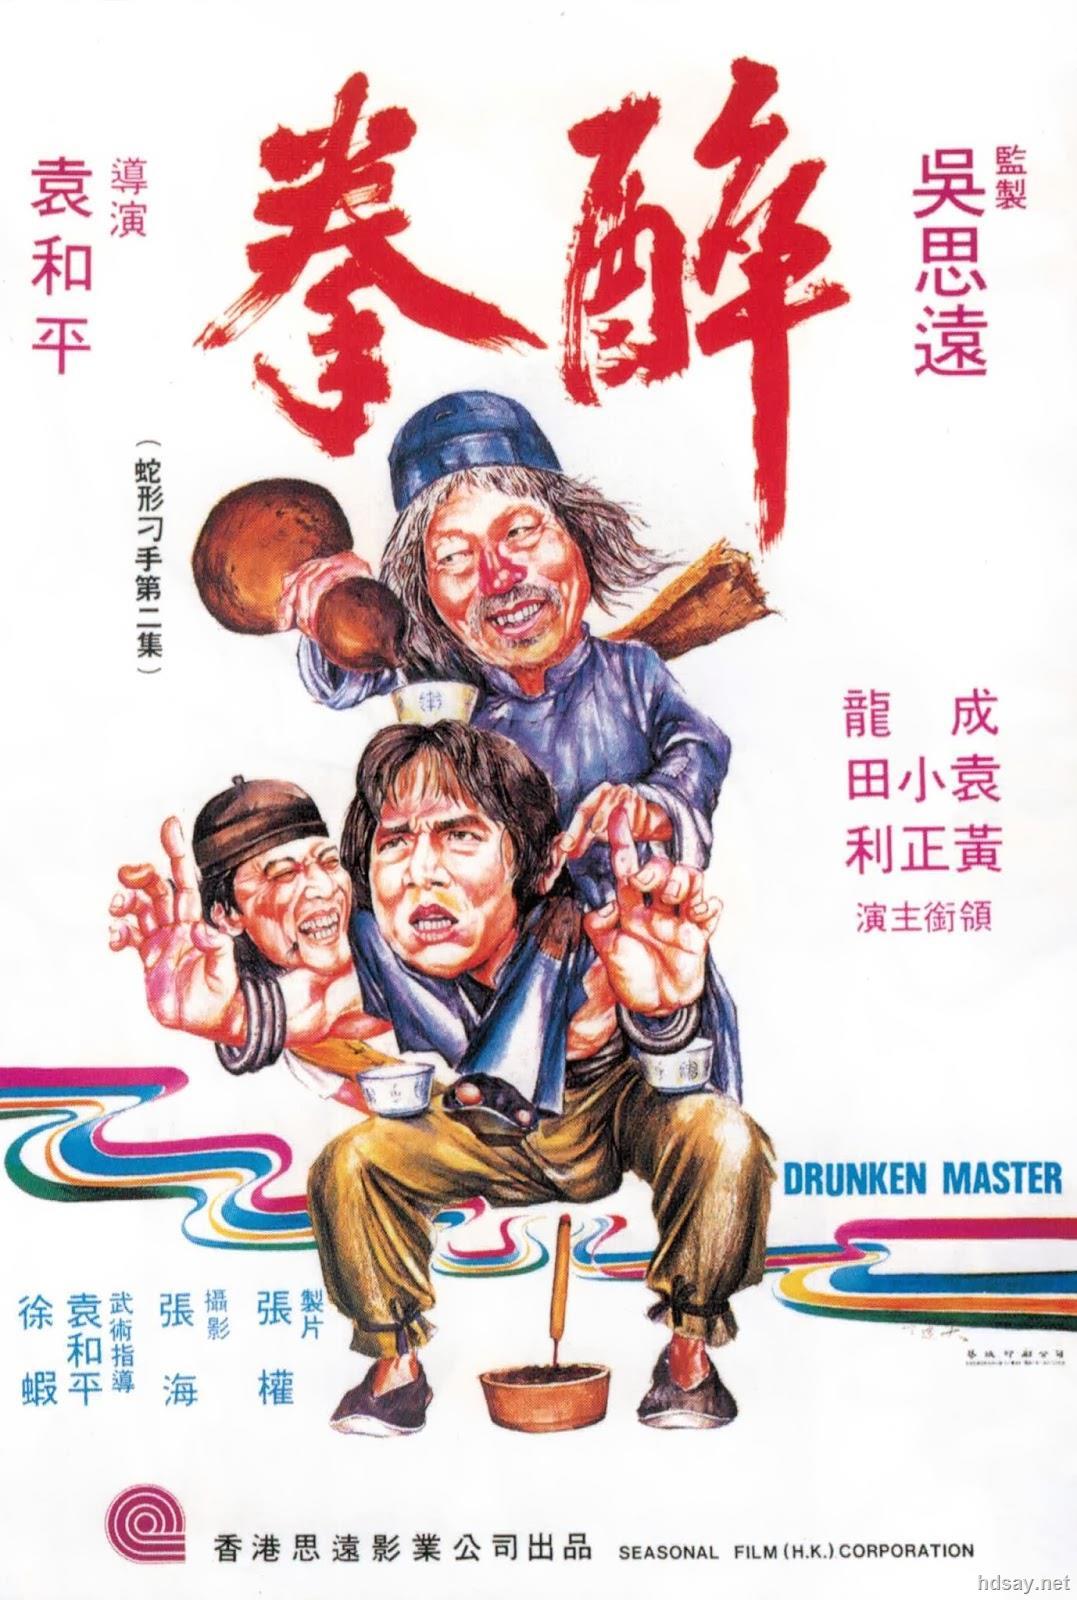 Zeoi Kyun (Drunken Master, 1978)